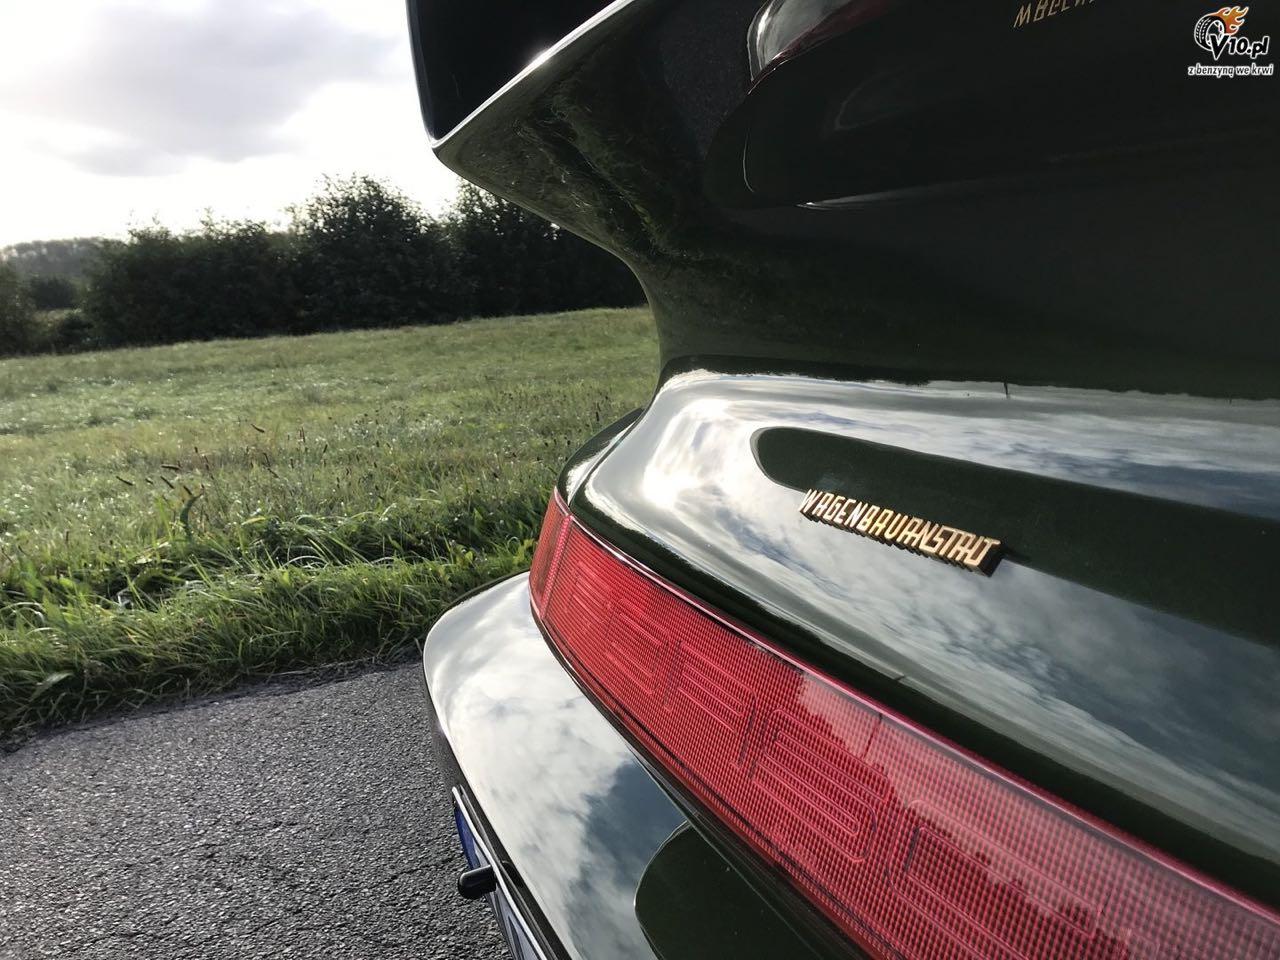 '93 Porsche 965 Turbo Wagenbauanstalt... custom ! 40